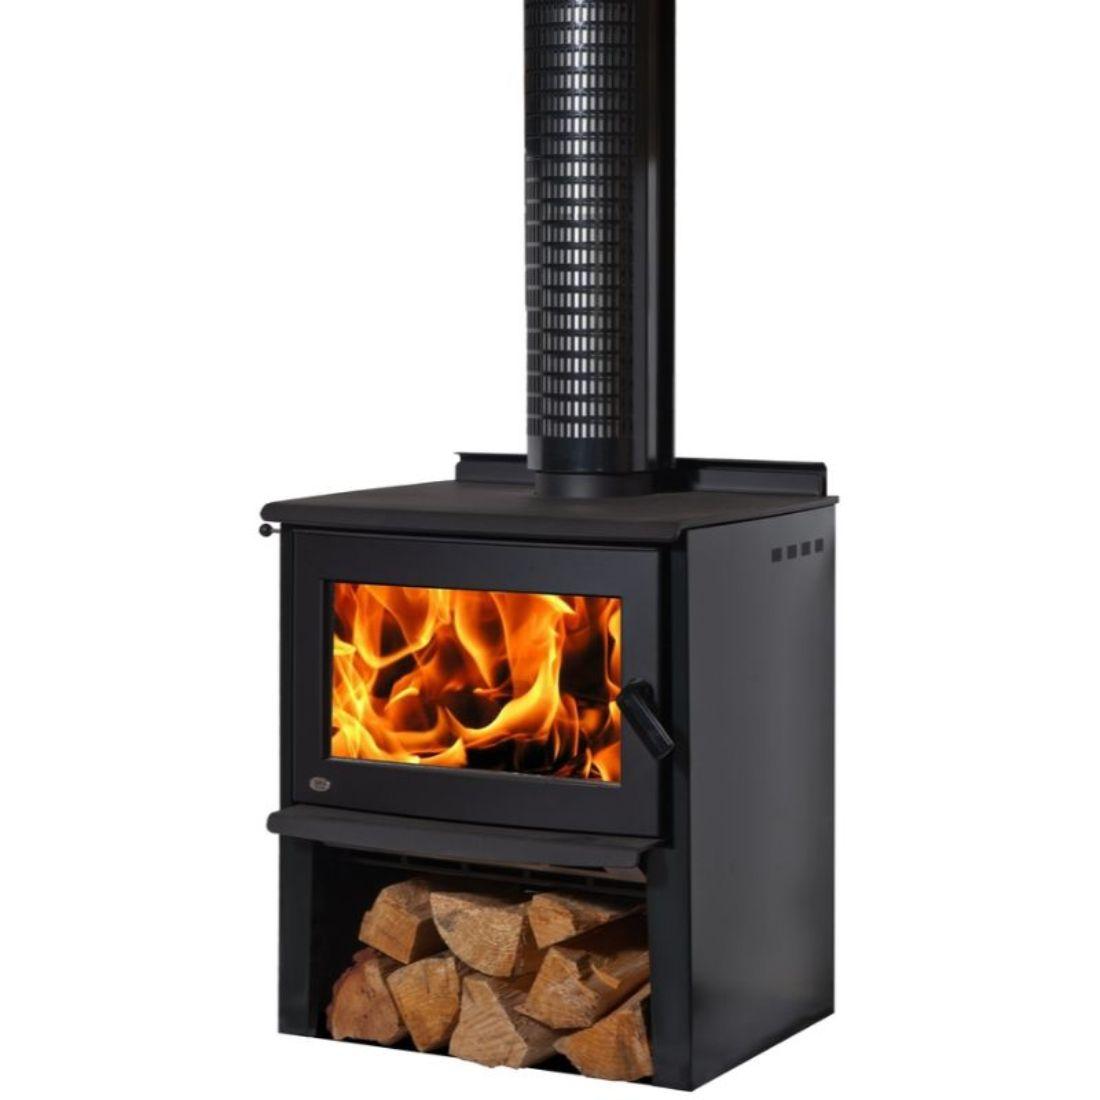 Fire Monte Euro Rural - Gunmetal Black